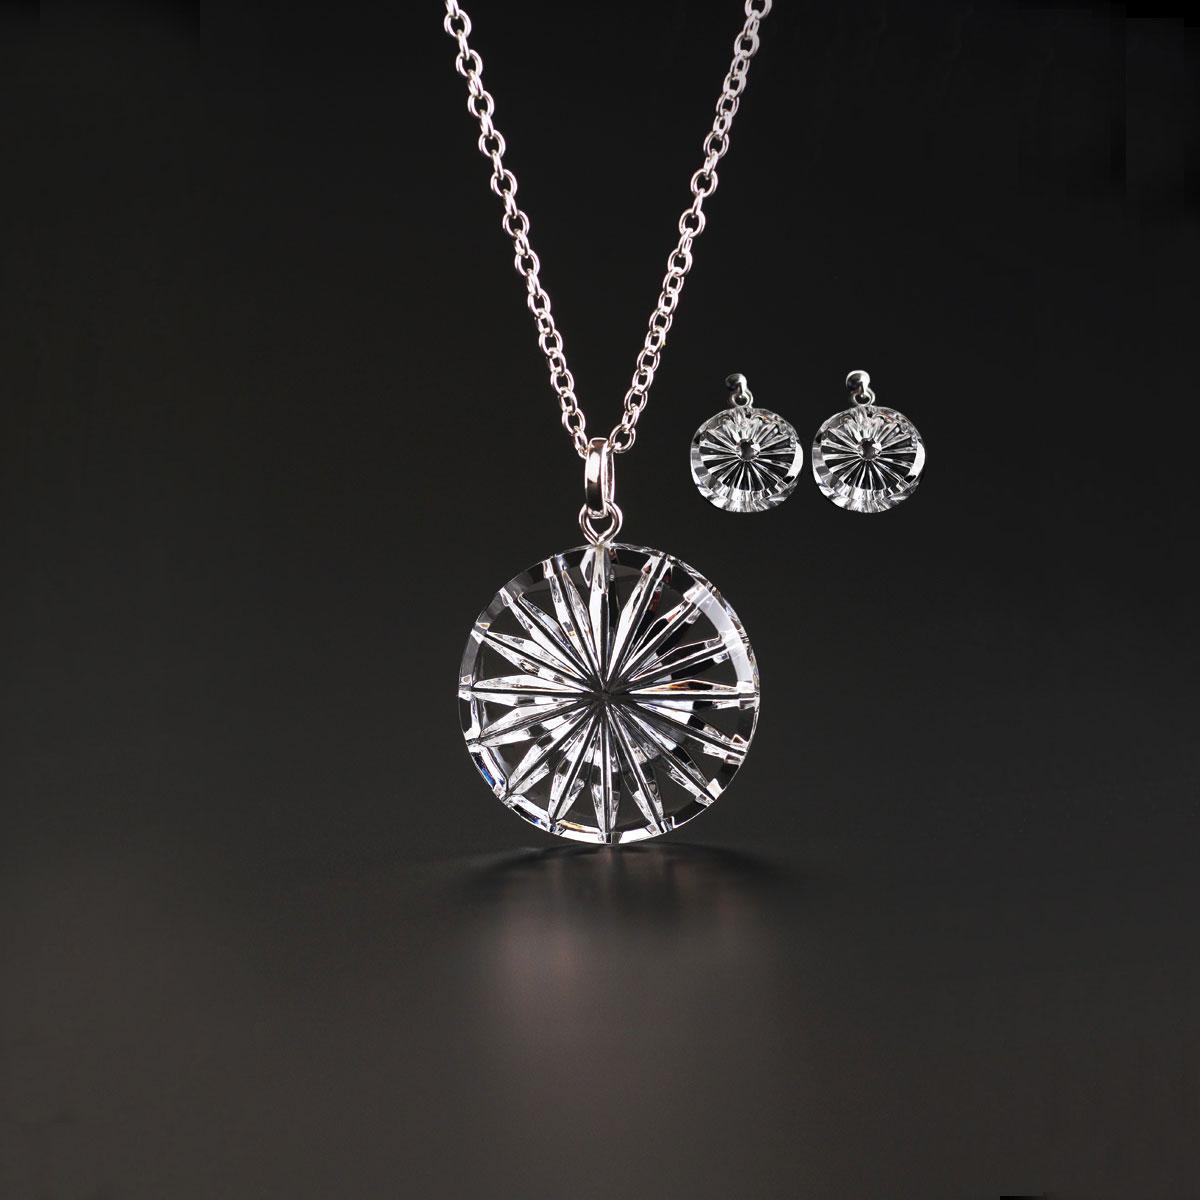 Cashs Ireland, Newgrange Circle Necklace and Pierced Earrings Gift Set